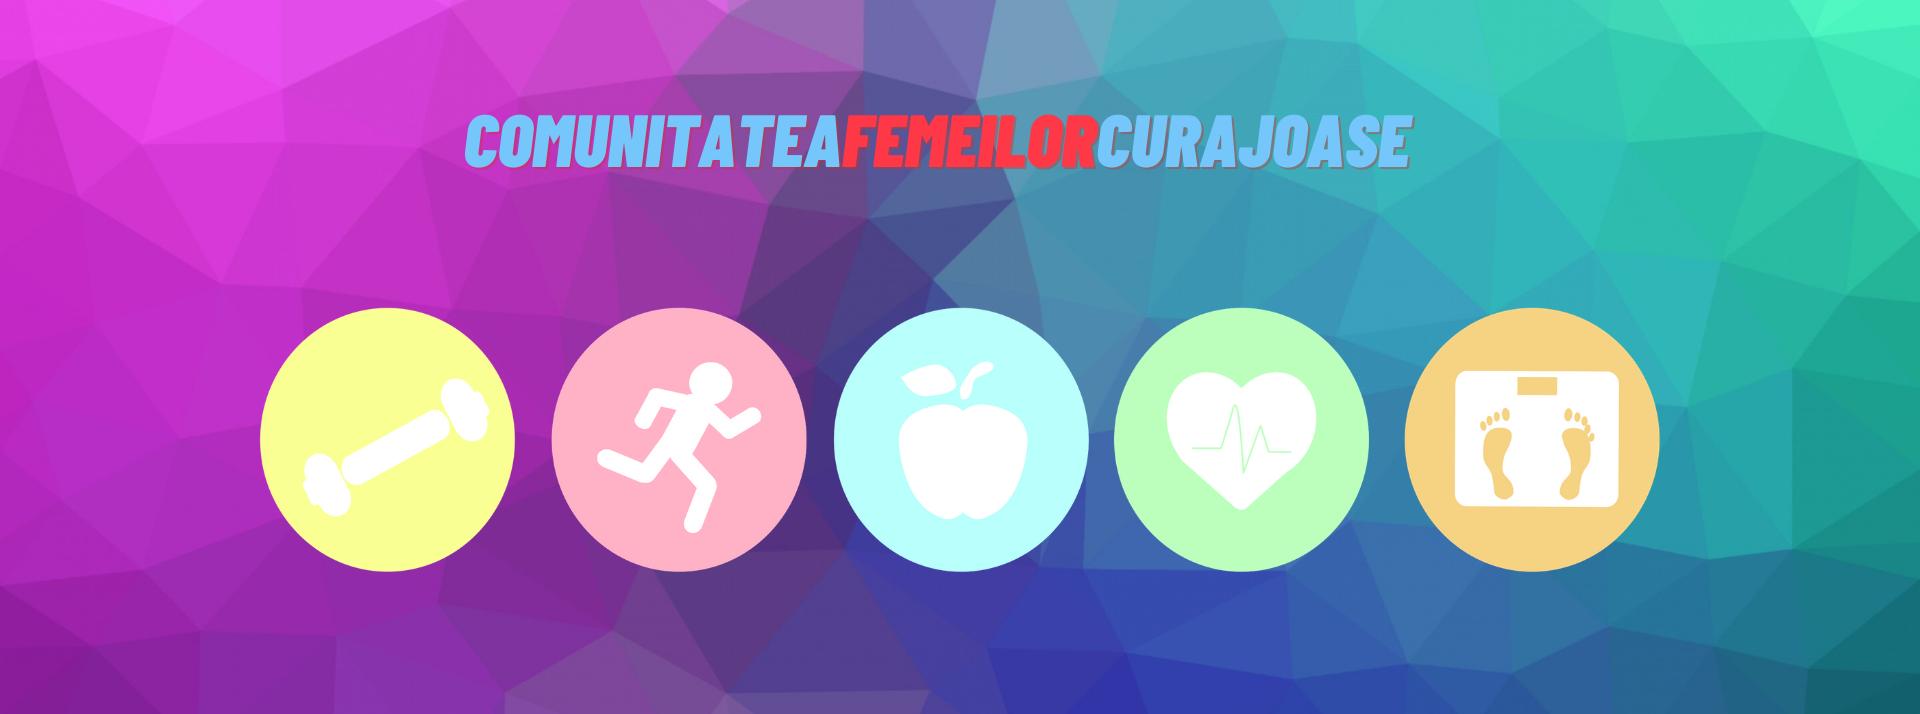 FITNESS, NUTRITIE SI MOTIVATIE LA FEMININ